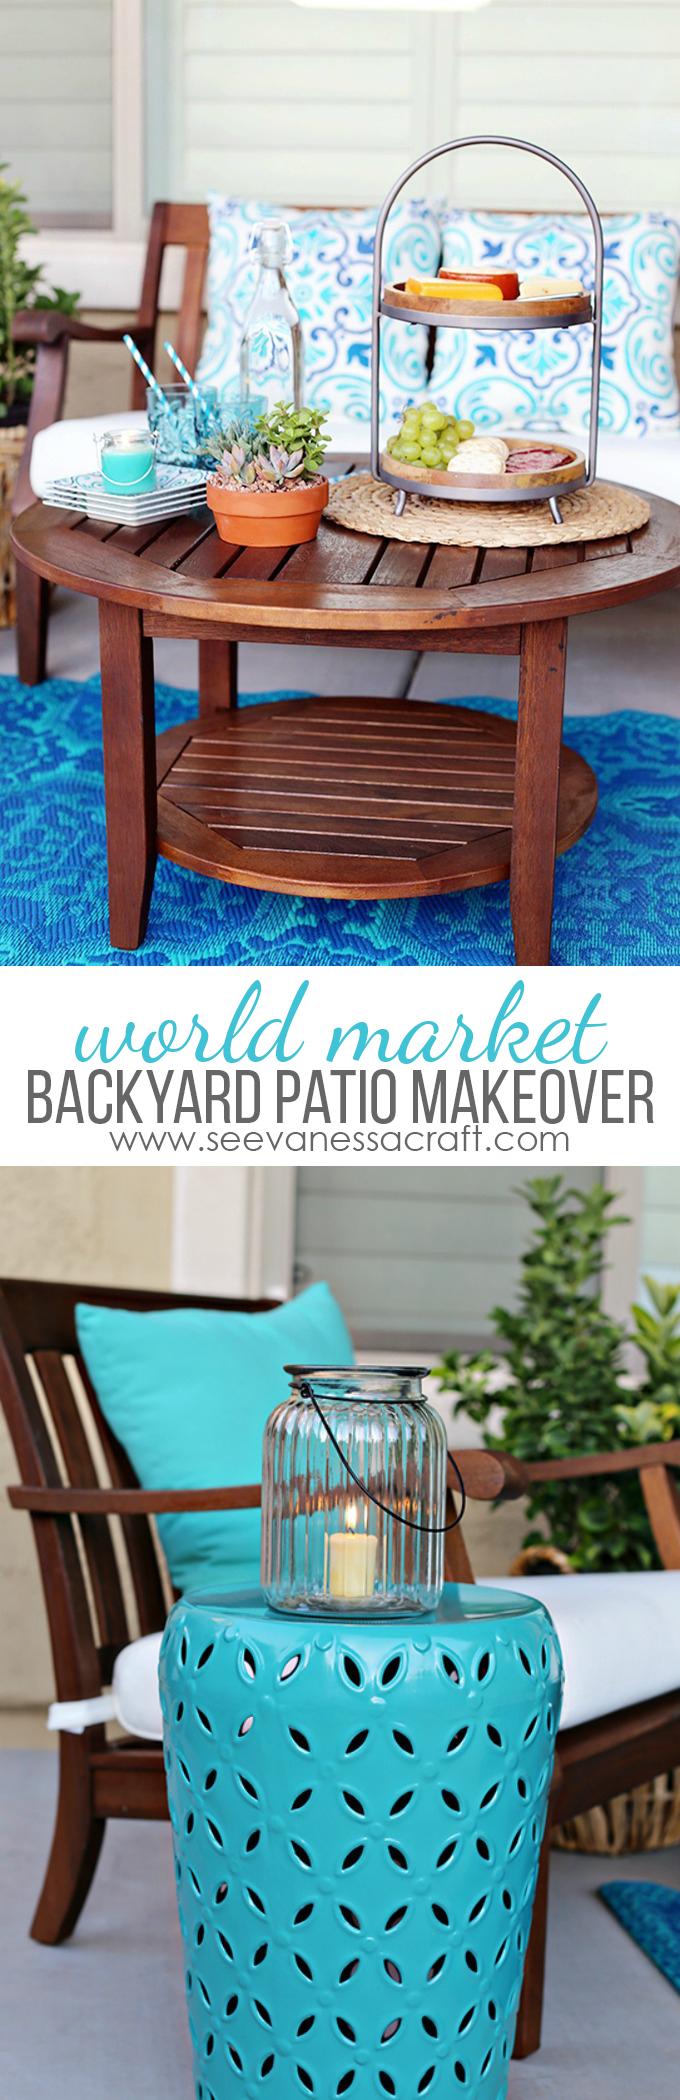 World Market Aqua Backyard Patio Makeover Ideas on Backyard Patio Makeover id=30660